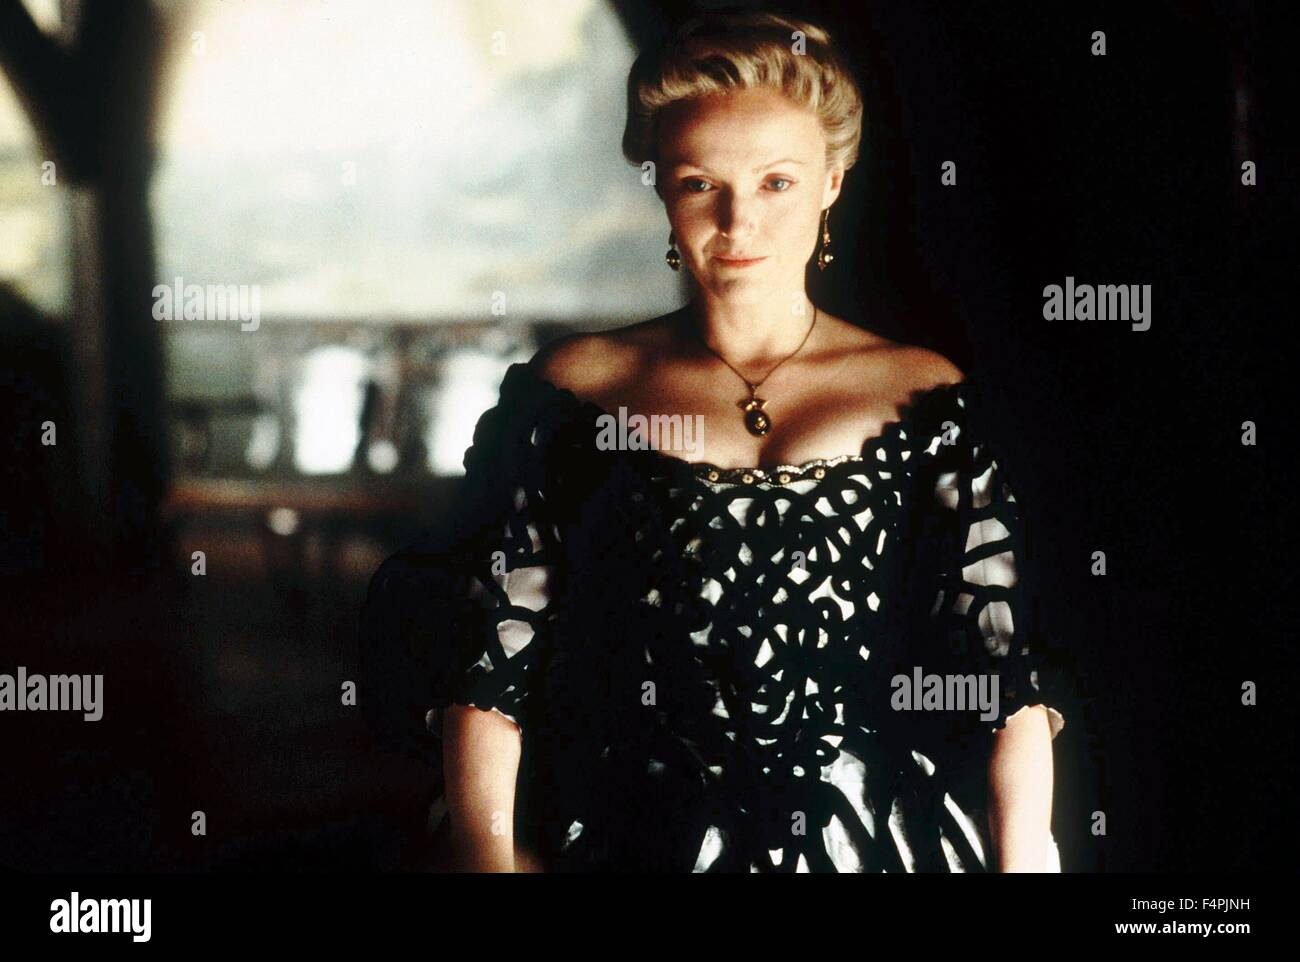 Miranda Richardson / Sleepy Hollow / 1999 directed by Tim Burton [Paramount Pictures] - Stock Image